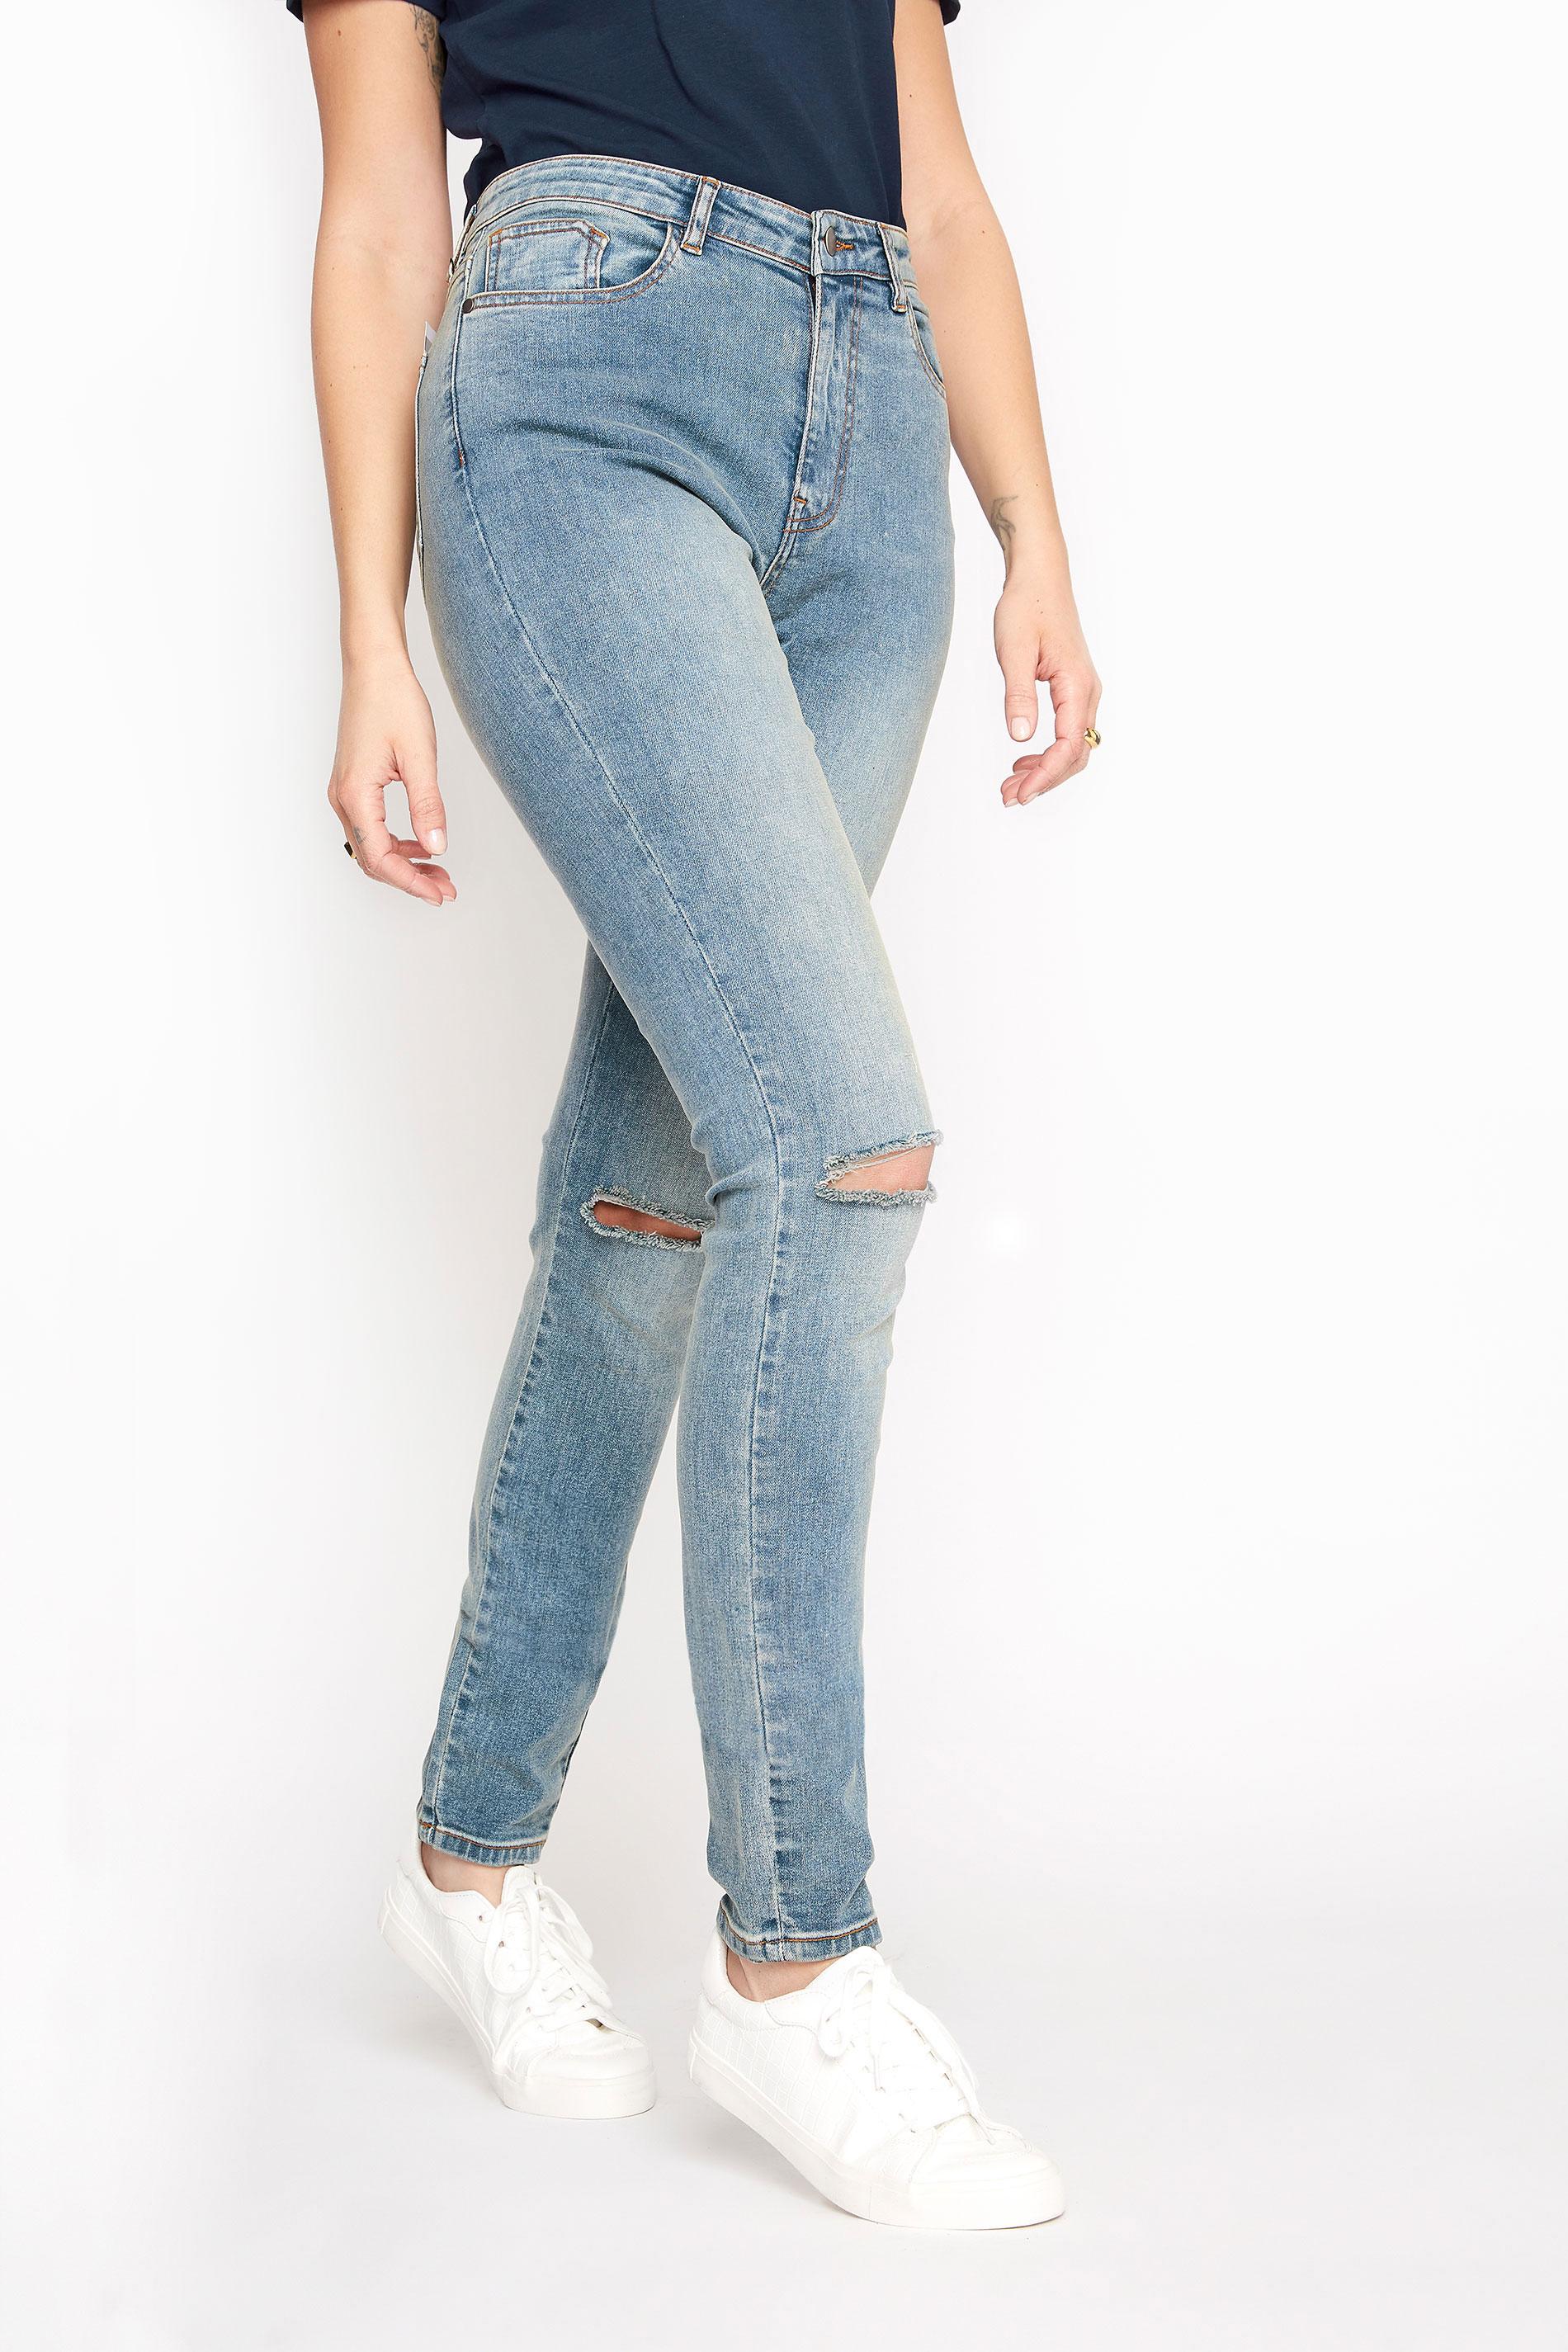 LTS Light Blue Vintage Ripped AVA Skinny Jeans